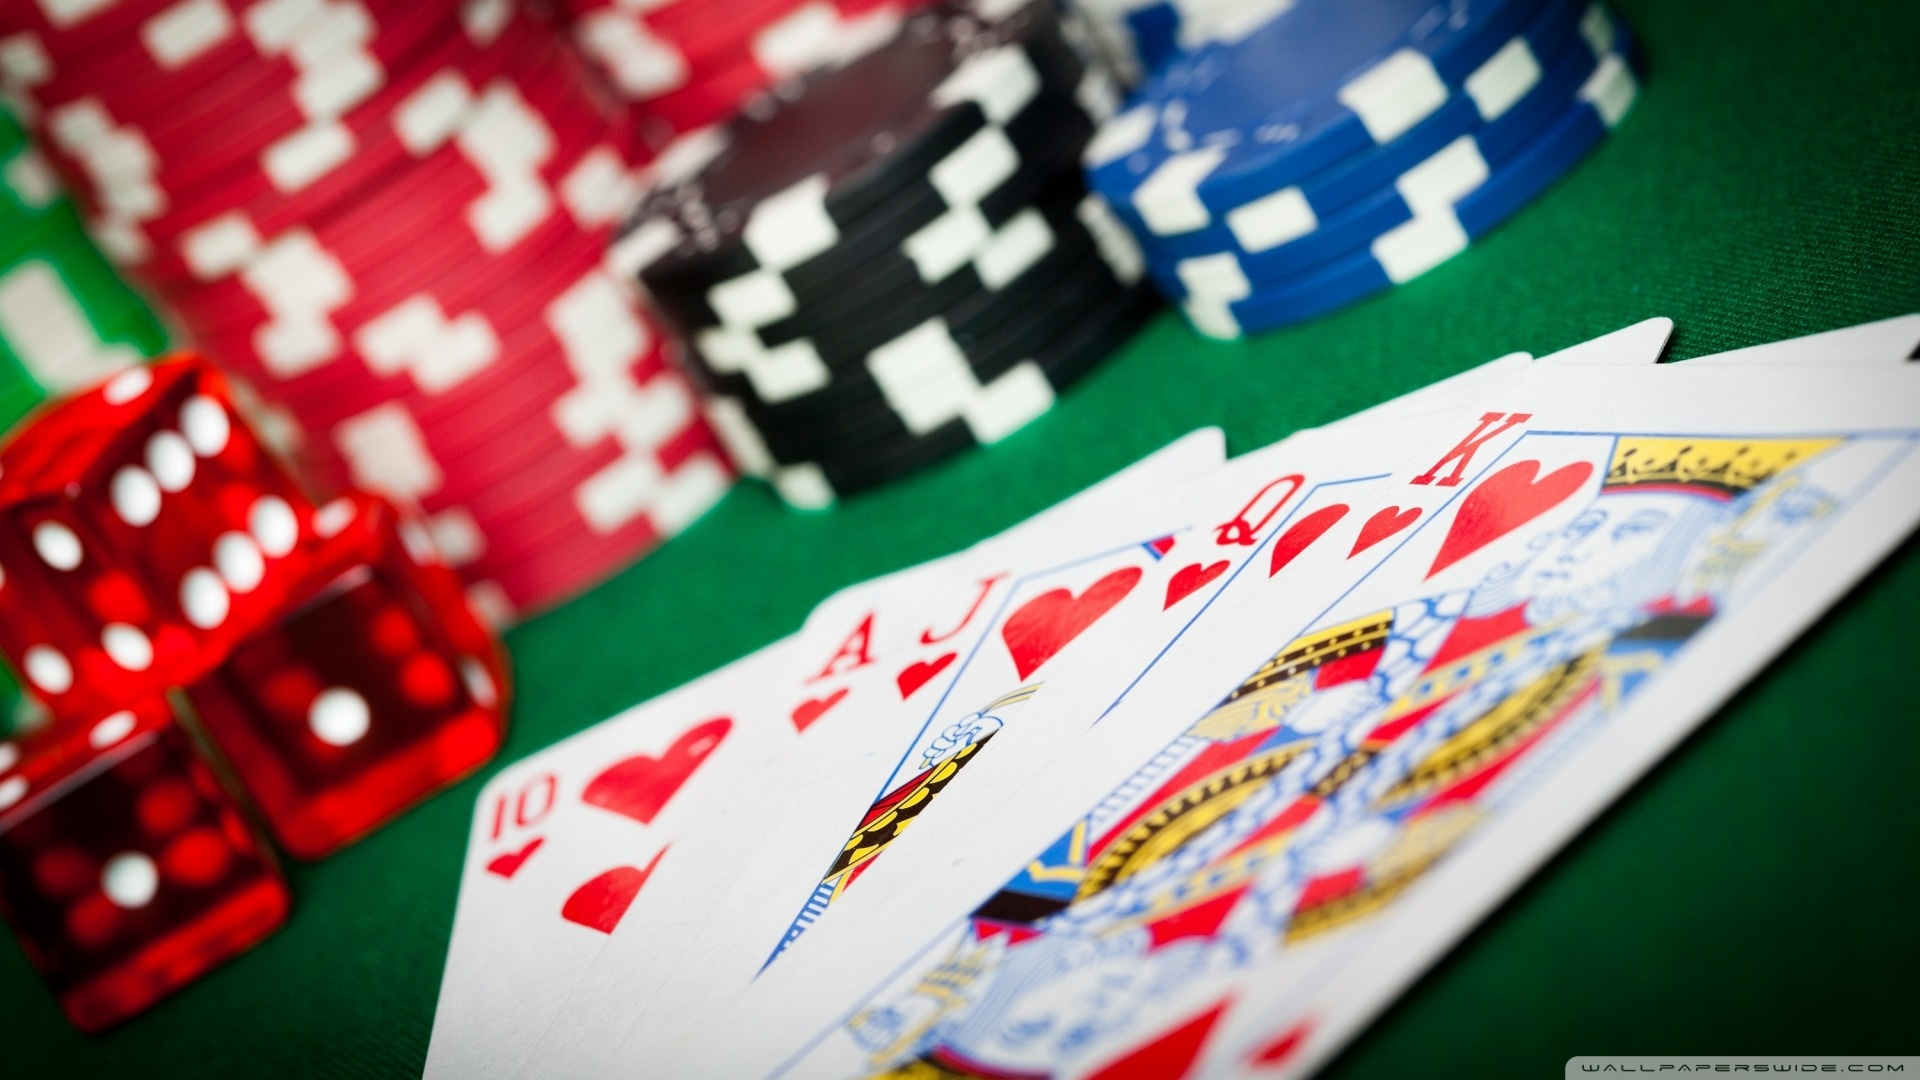 Gambling Wallpapers - Gambling 1920 X 1080 - 1920x1080 - Download HD  Wallpaper - WallpaperTip